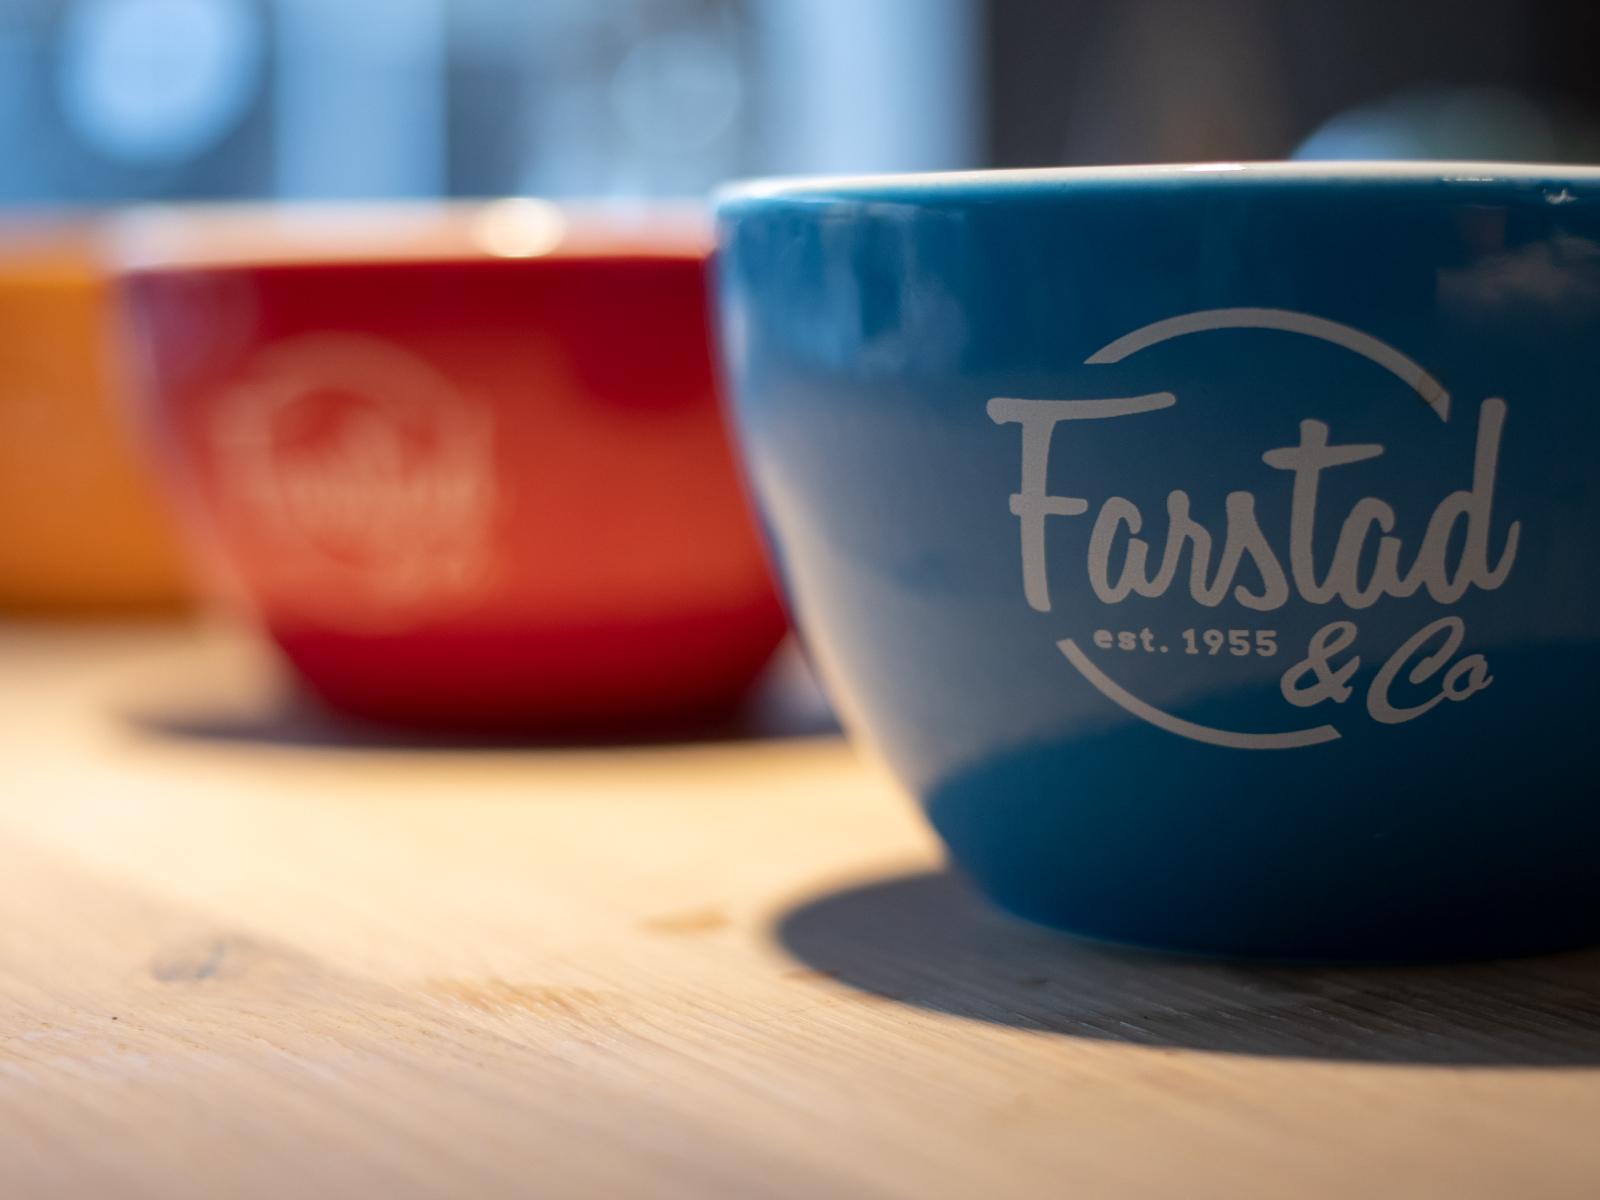 Farstad & Co. Coffee Mugs